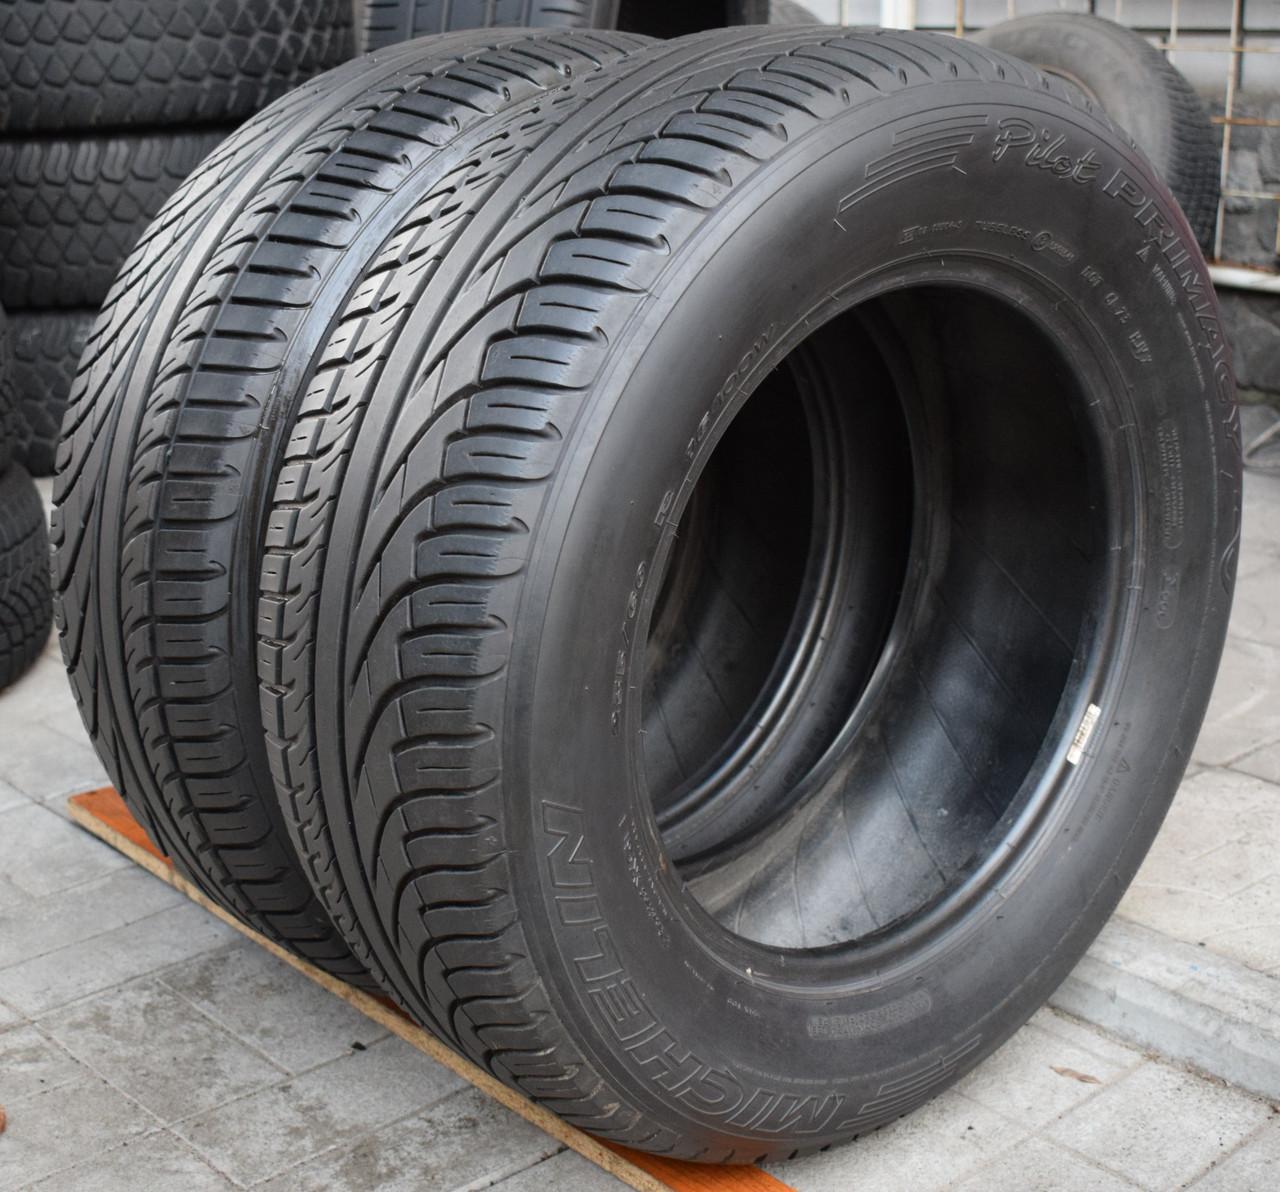 Шины б/у 235/60 R16 Michelin Pilot Primacy, ЛЕТО, 6-7 мм, пара